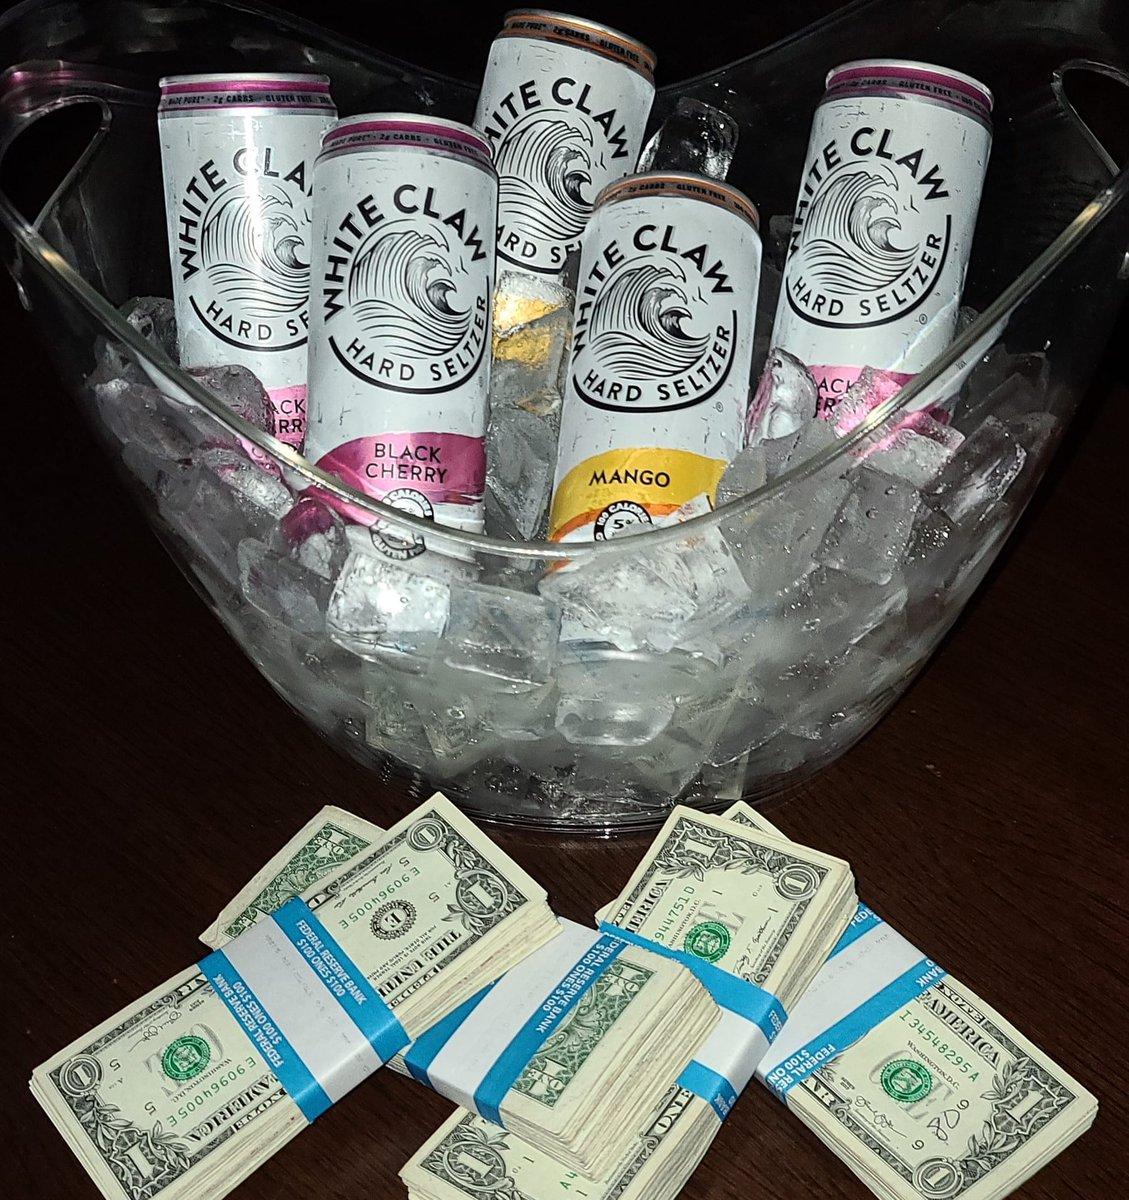 Now serving #WhiteClawWednesday   #mango & #blackcherry #diamonddollspompano #nightlife #stripclub #pompanobeach #poledancer #club #music #gentlemensclub #dancers https://t.co/JCrr2GW85n